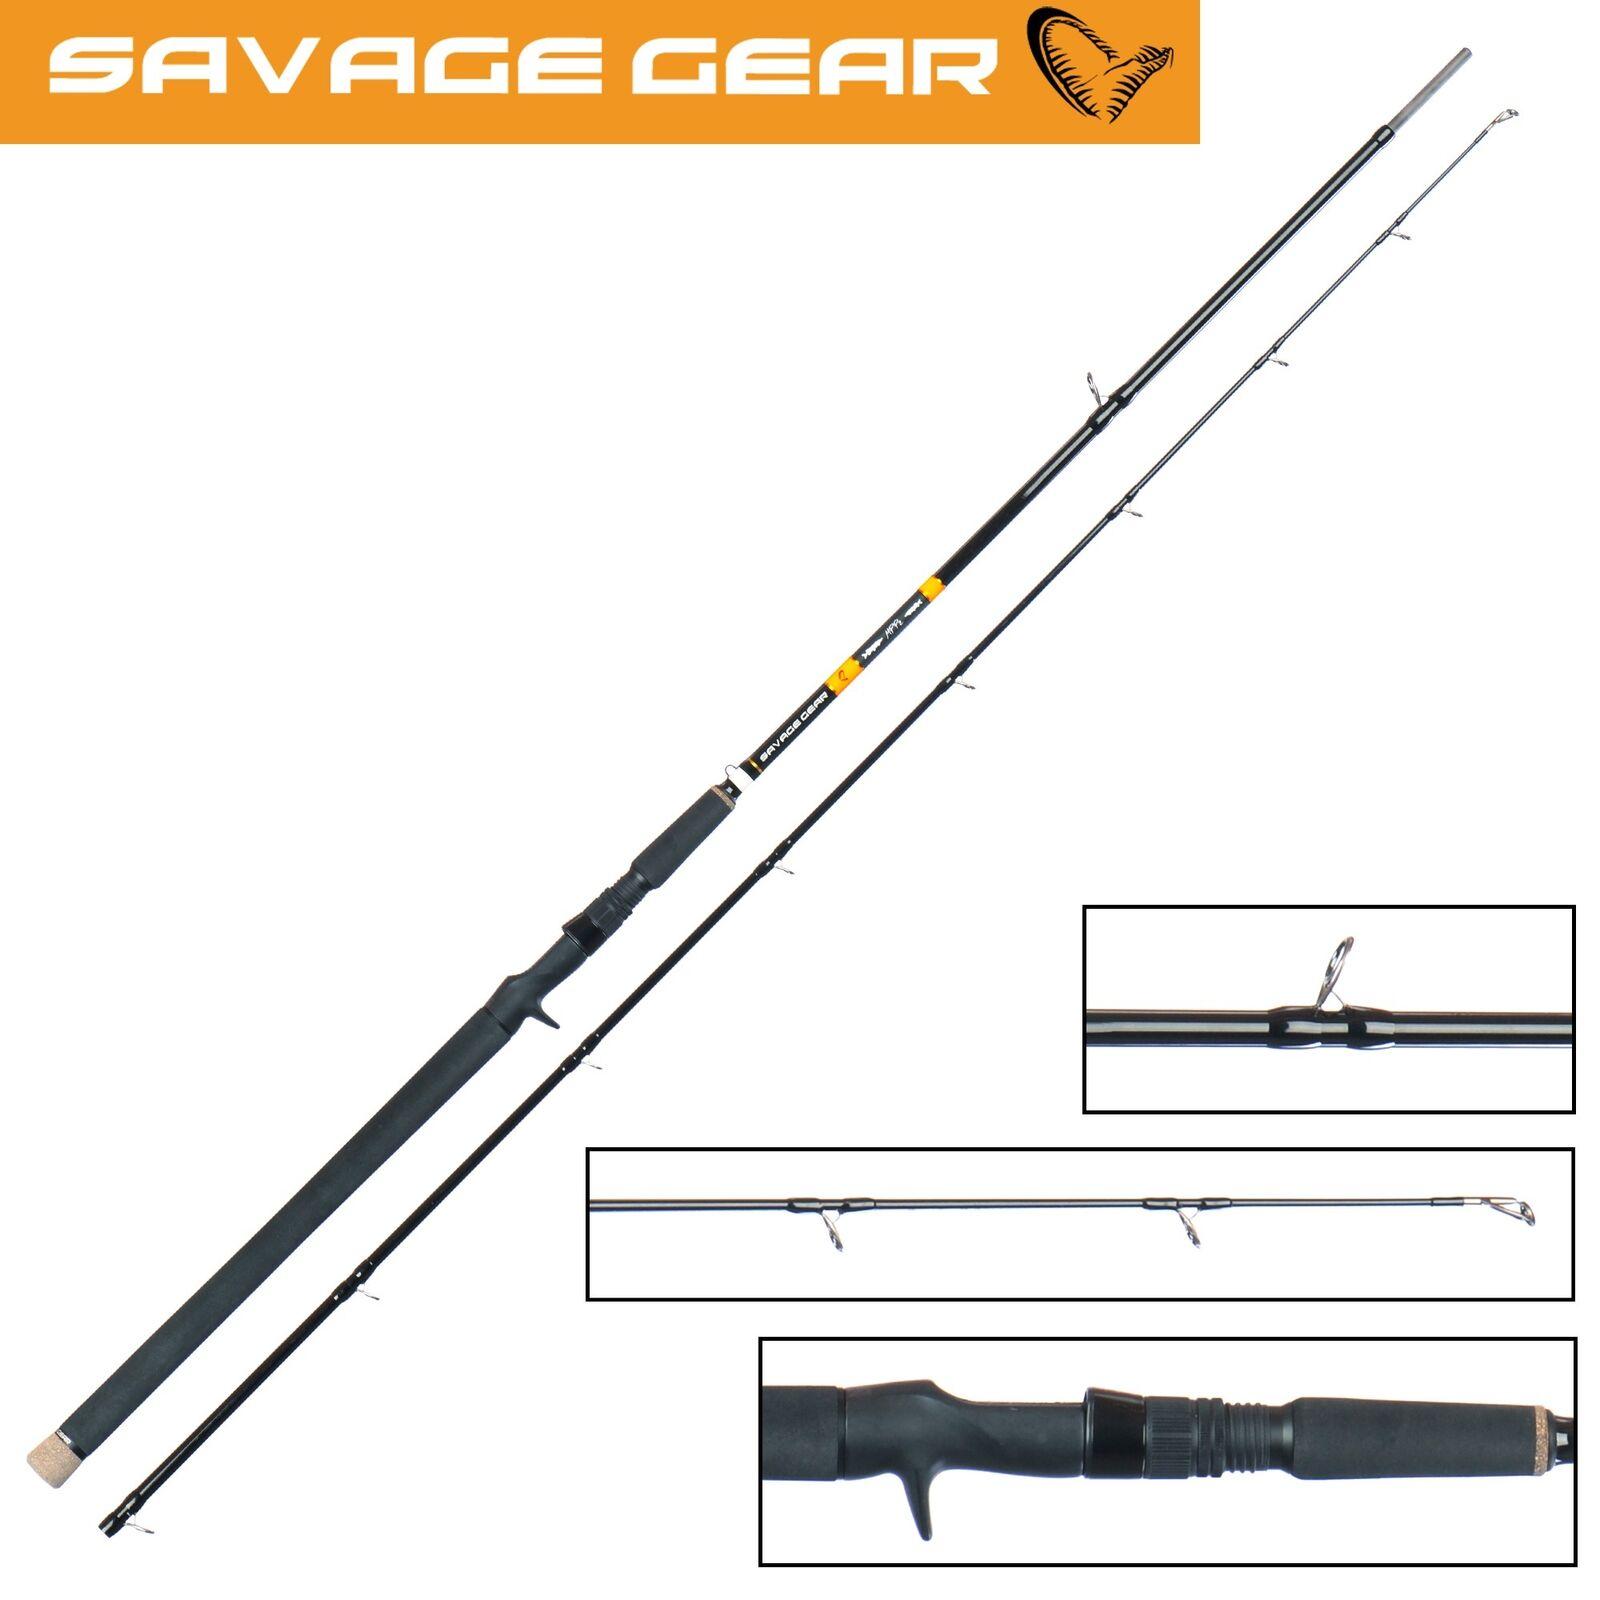 Savage Gear MPP2 Trigger Spinnrute 277cm 250g - Swimbaitrute, Hechtrute